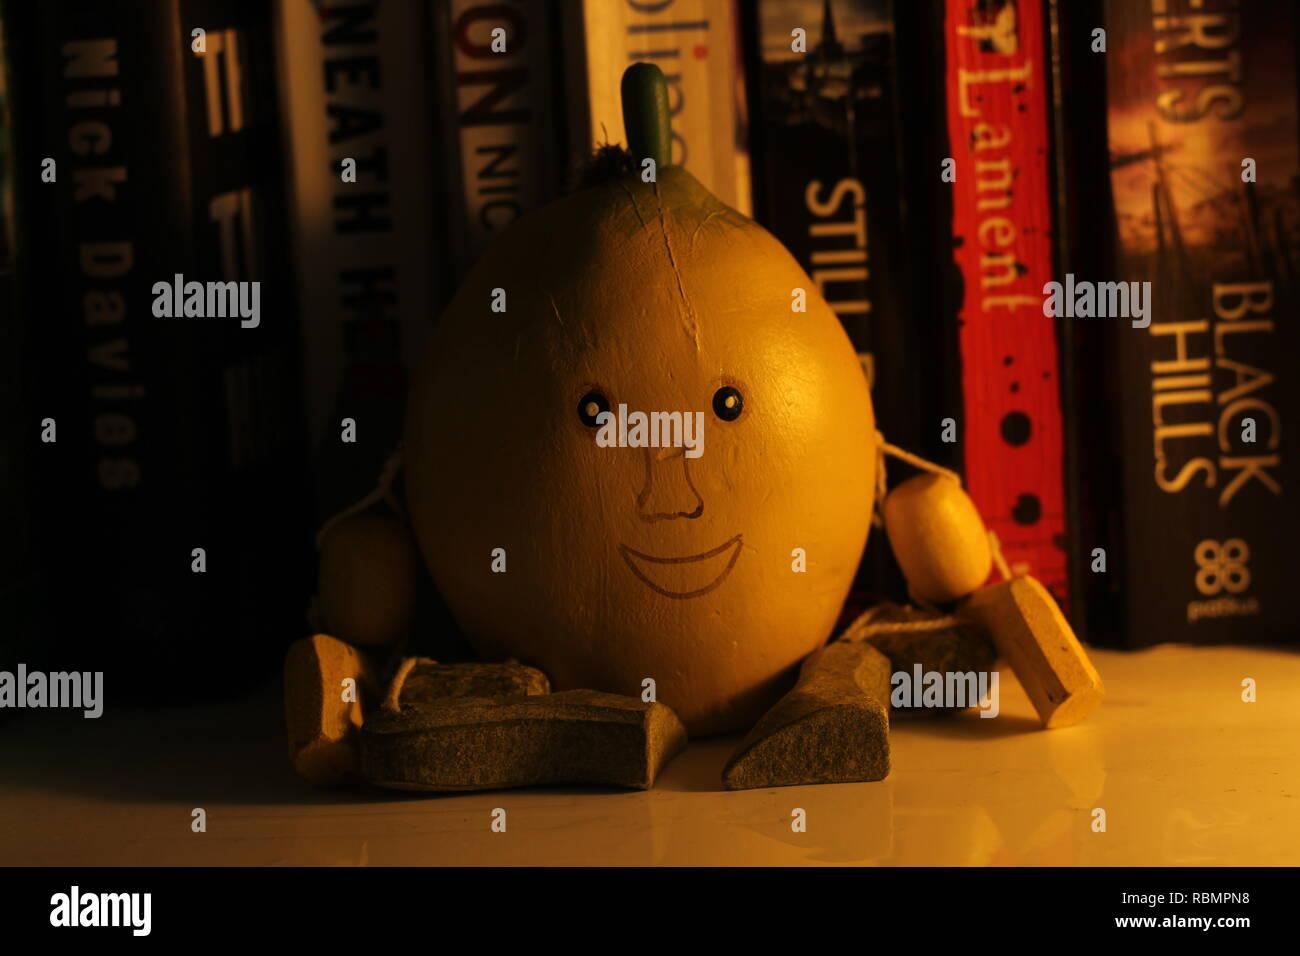 The Lemon on the Bookshelf - Literacy & Reading  Imagine a Good Read